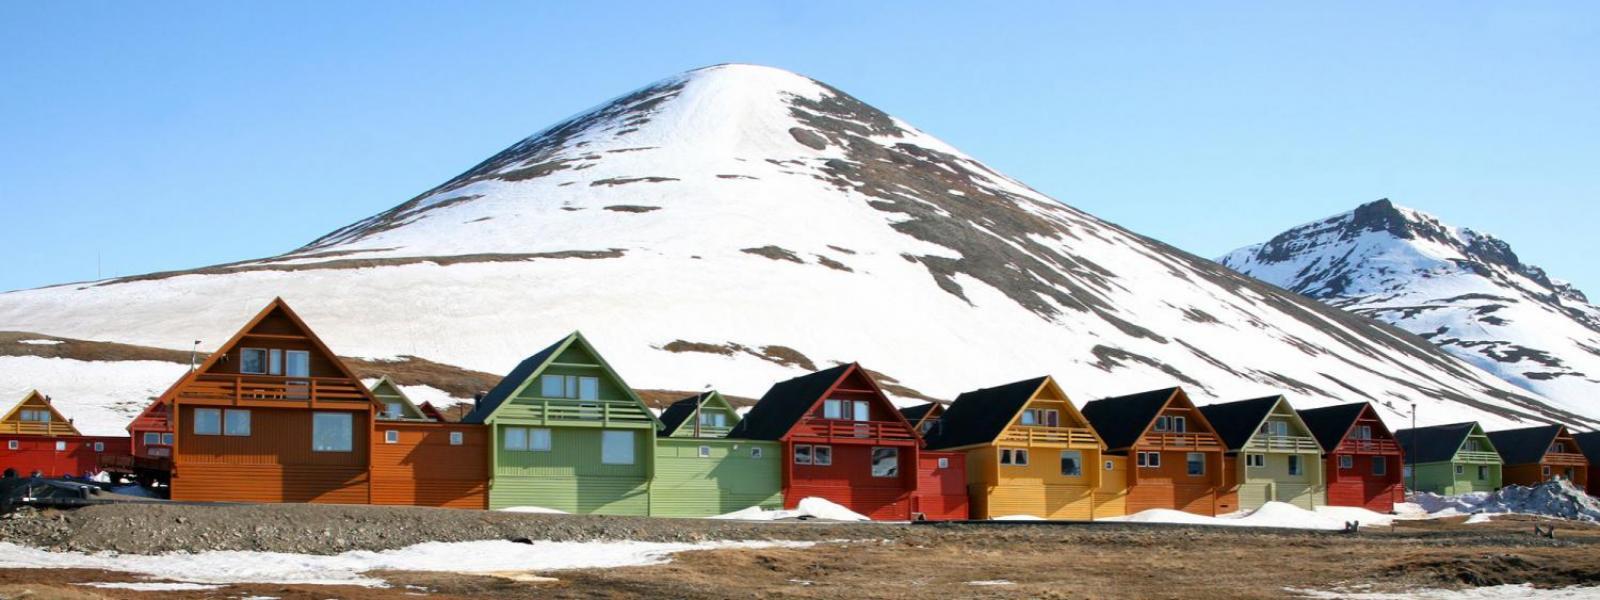 Svalbard%2C-Longyear-city%2C-Norway_Header.jpg?itok=kiXl0Mgf&c=7c08e1b31feb5713c5b794c96cf6a8a6